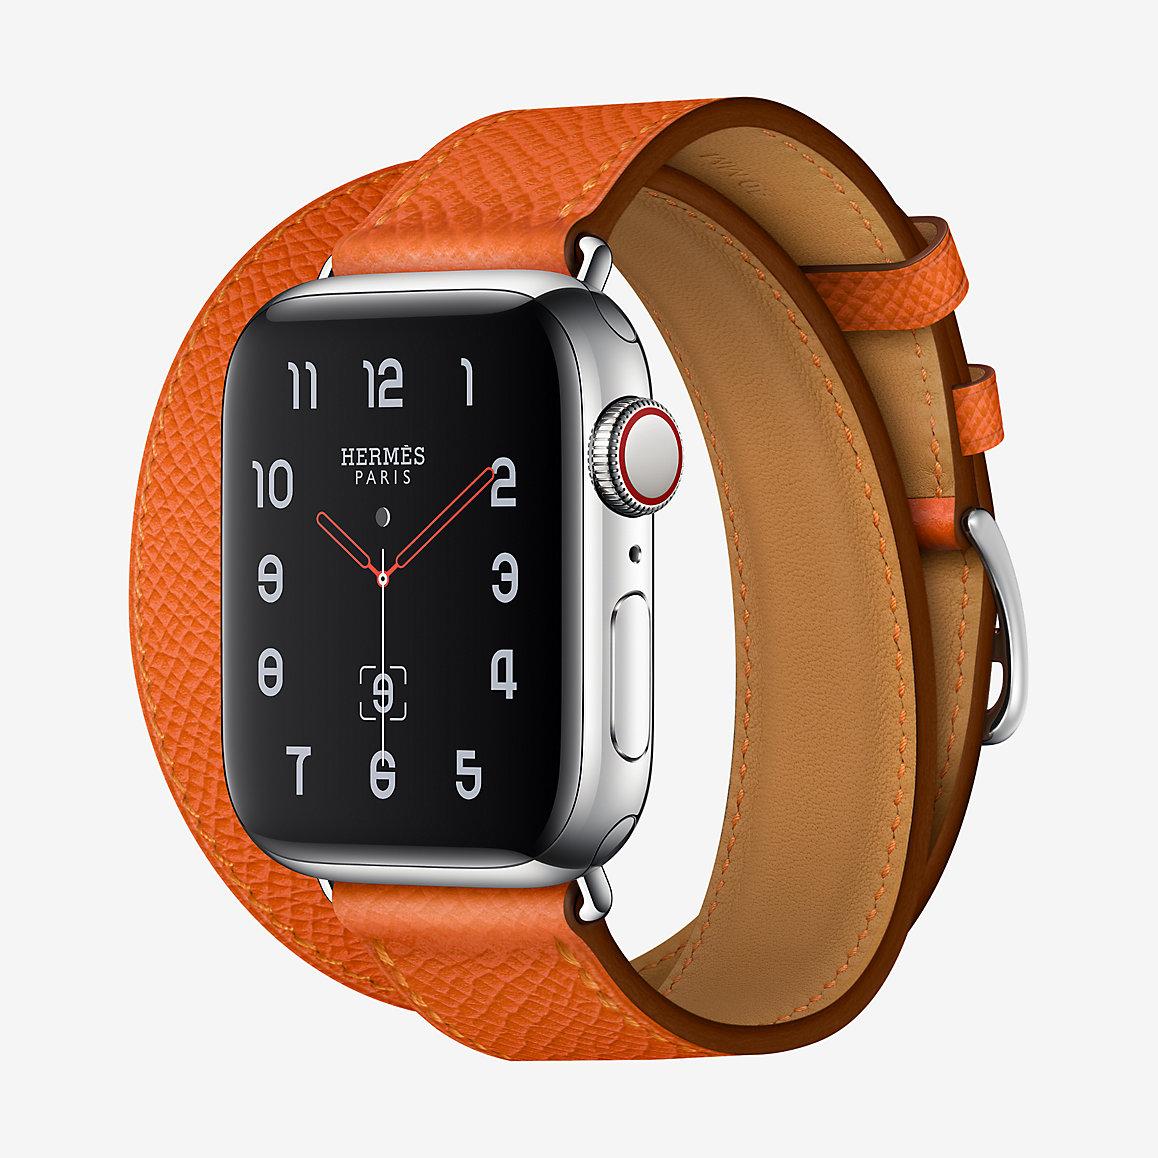 boitier-awh-s4-inox-40mm-world-wide-apple-watch-hermes-strap-double-tour-40mm--DT40WWVFEU-front-2-300-0-1158-1158.jpg